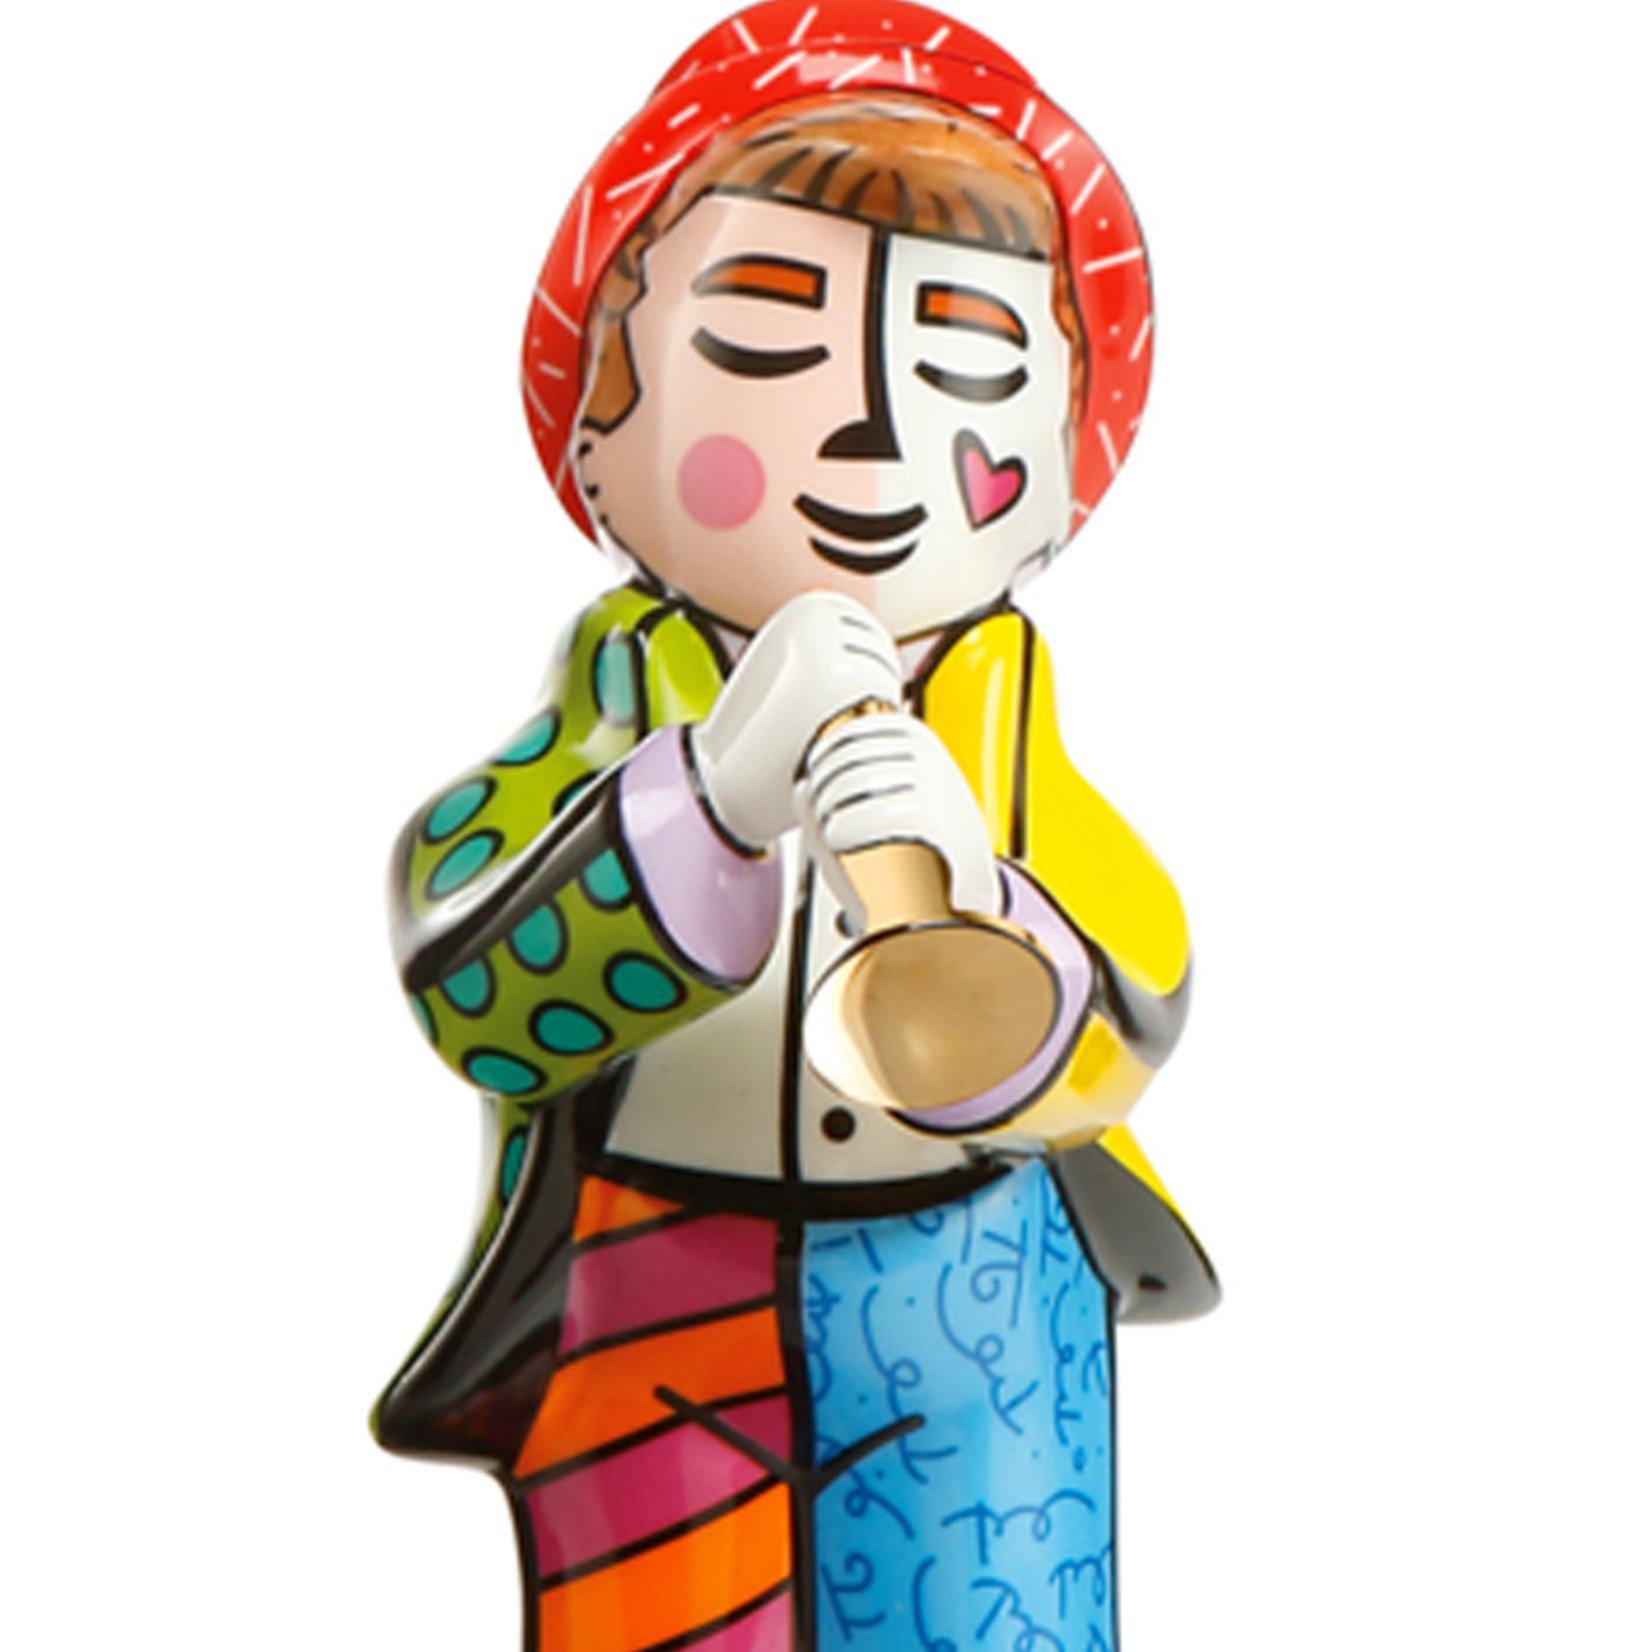 Goebel Porzellanmanufaktur Figur Trompeter | Romero Britto | Goebel Porzellan